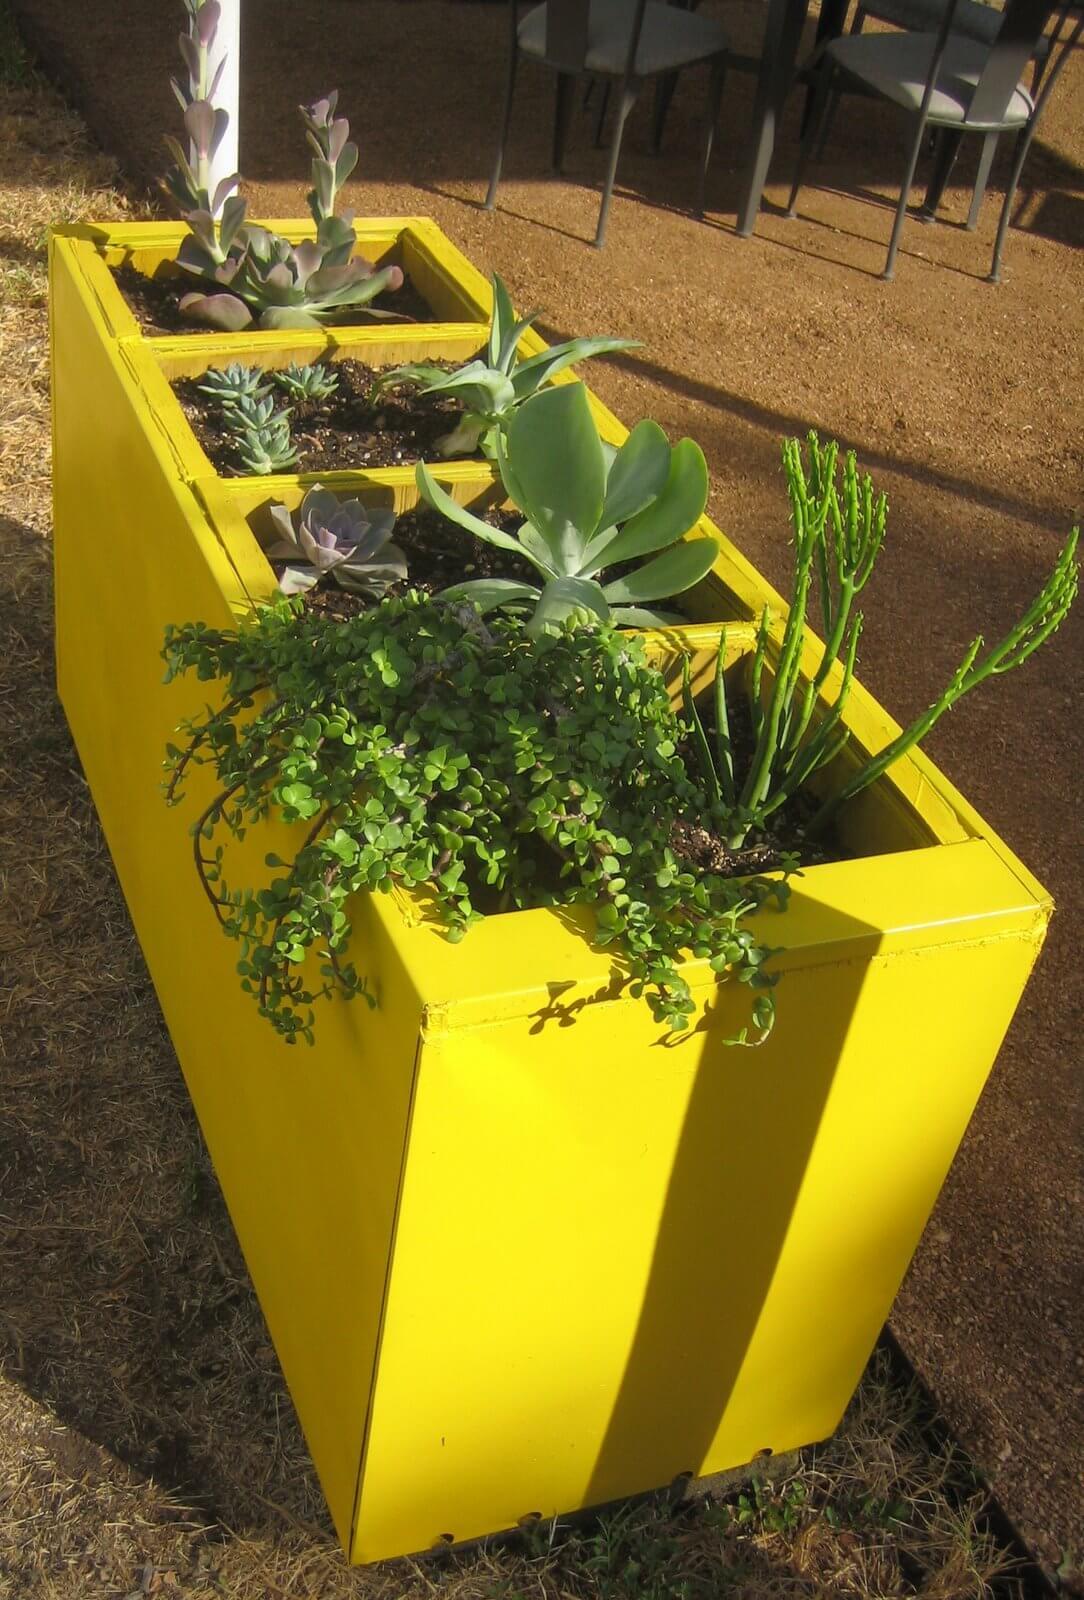 Vibrant Raised Garden That Makes a Statement